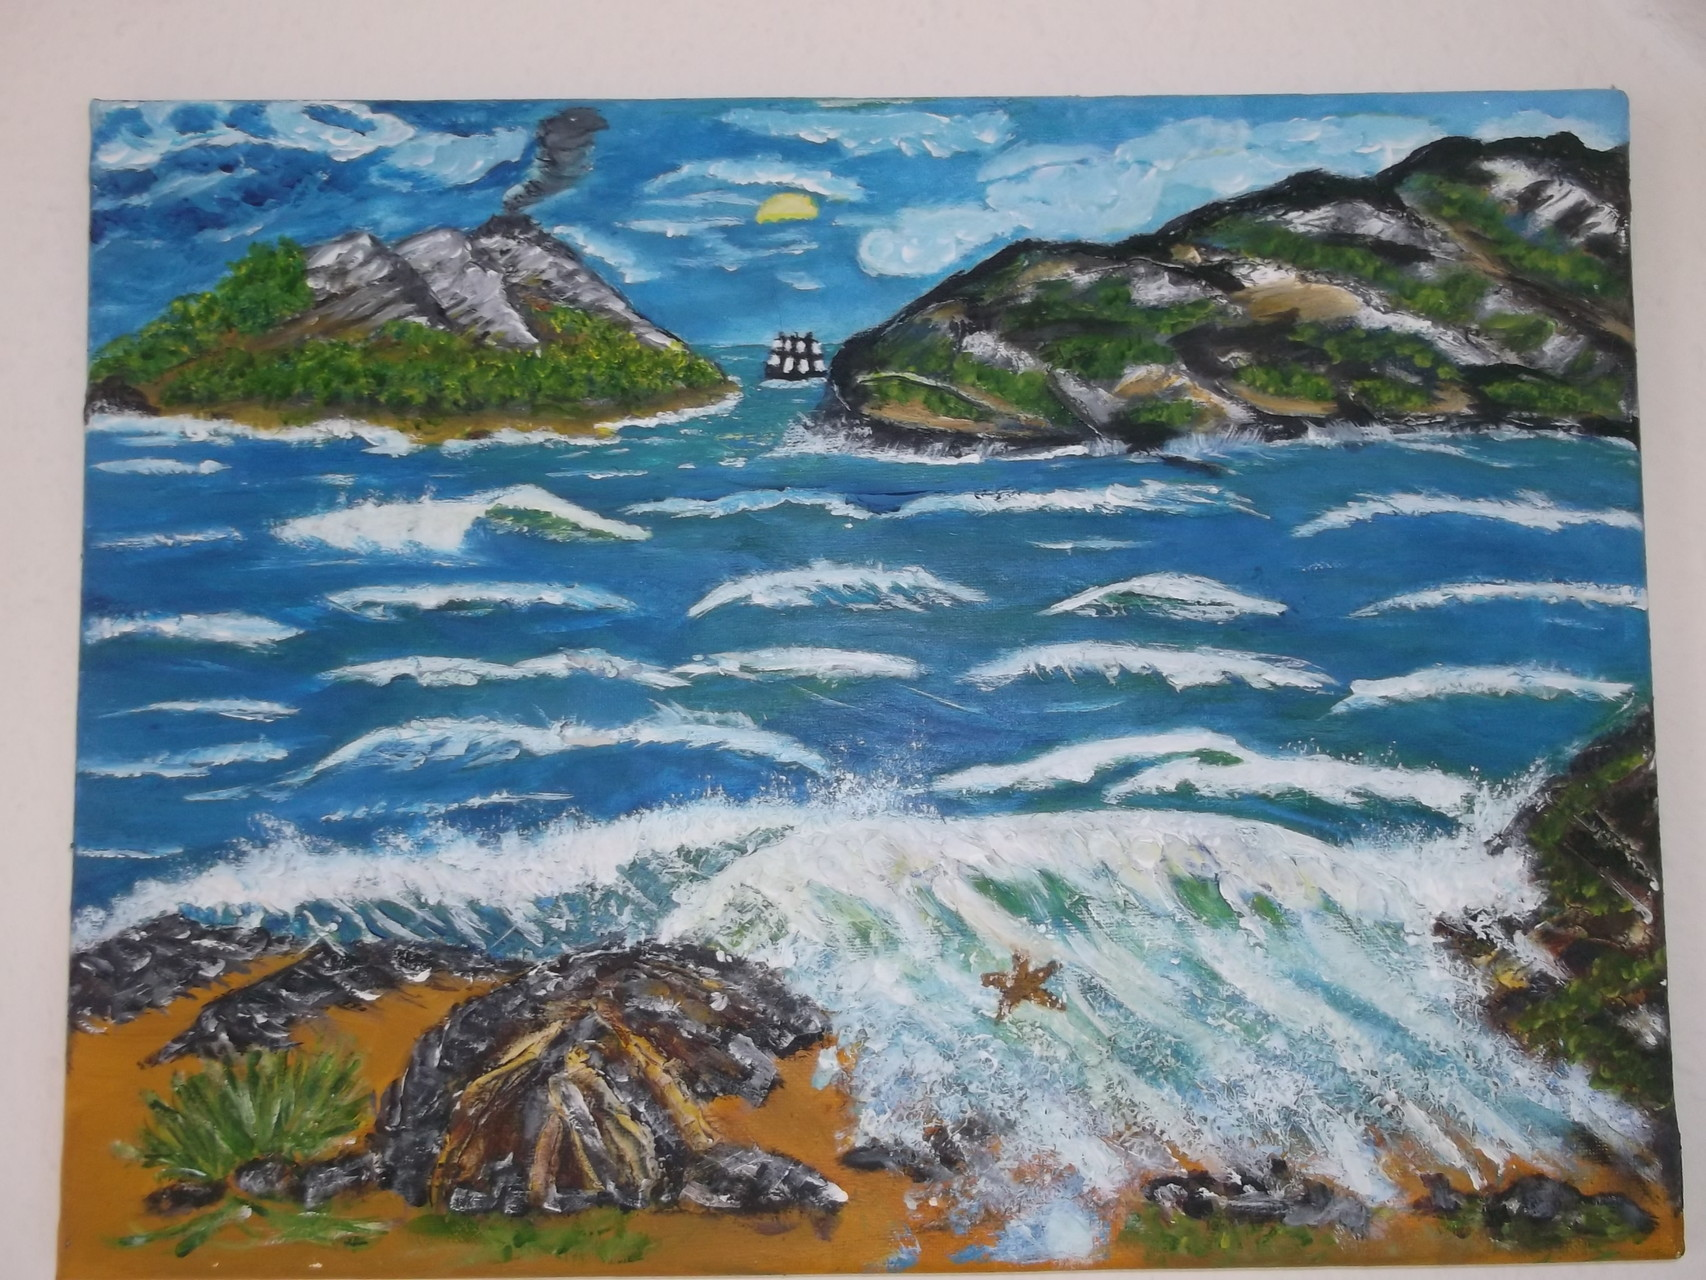 Südseeinseln:  (Leinwand) 45 cm x 35 cm